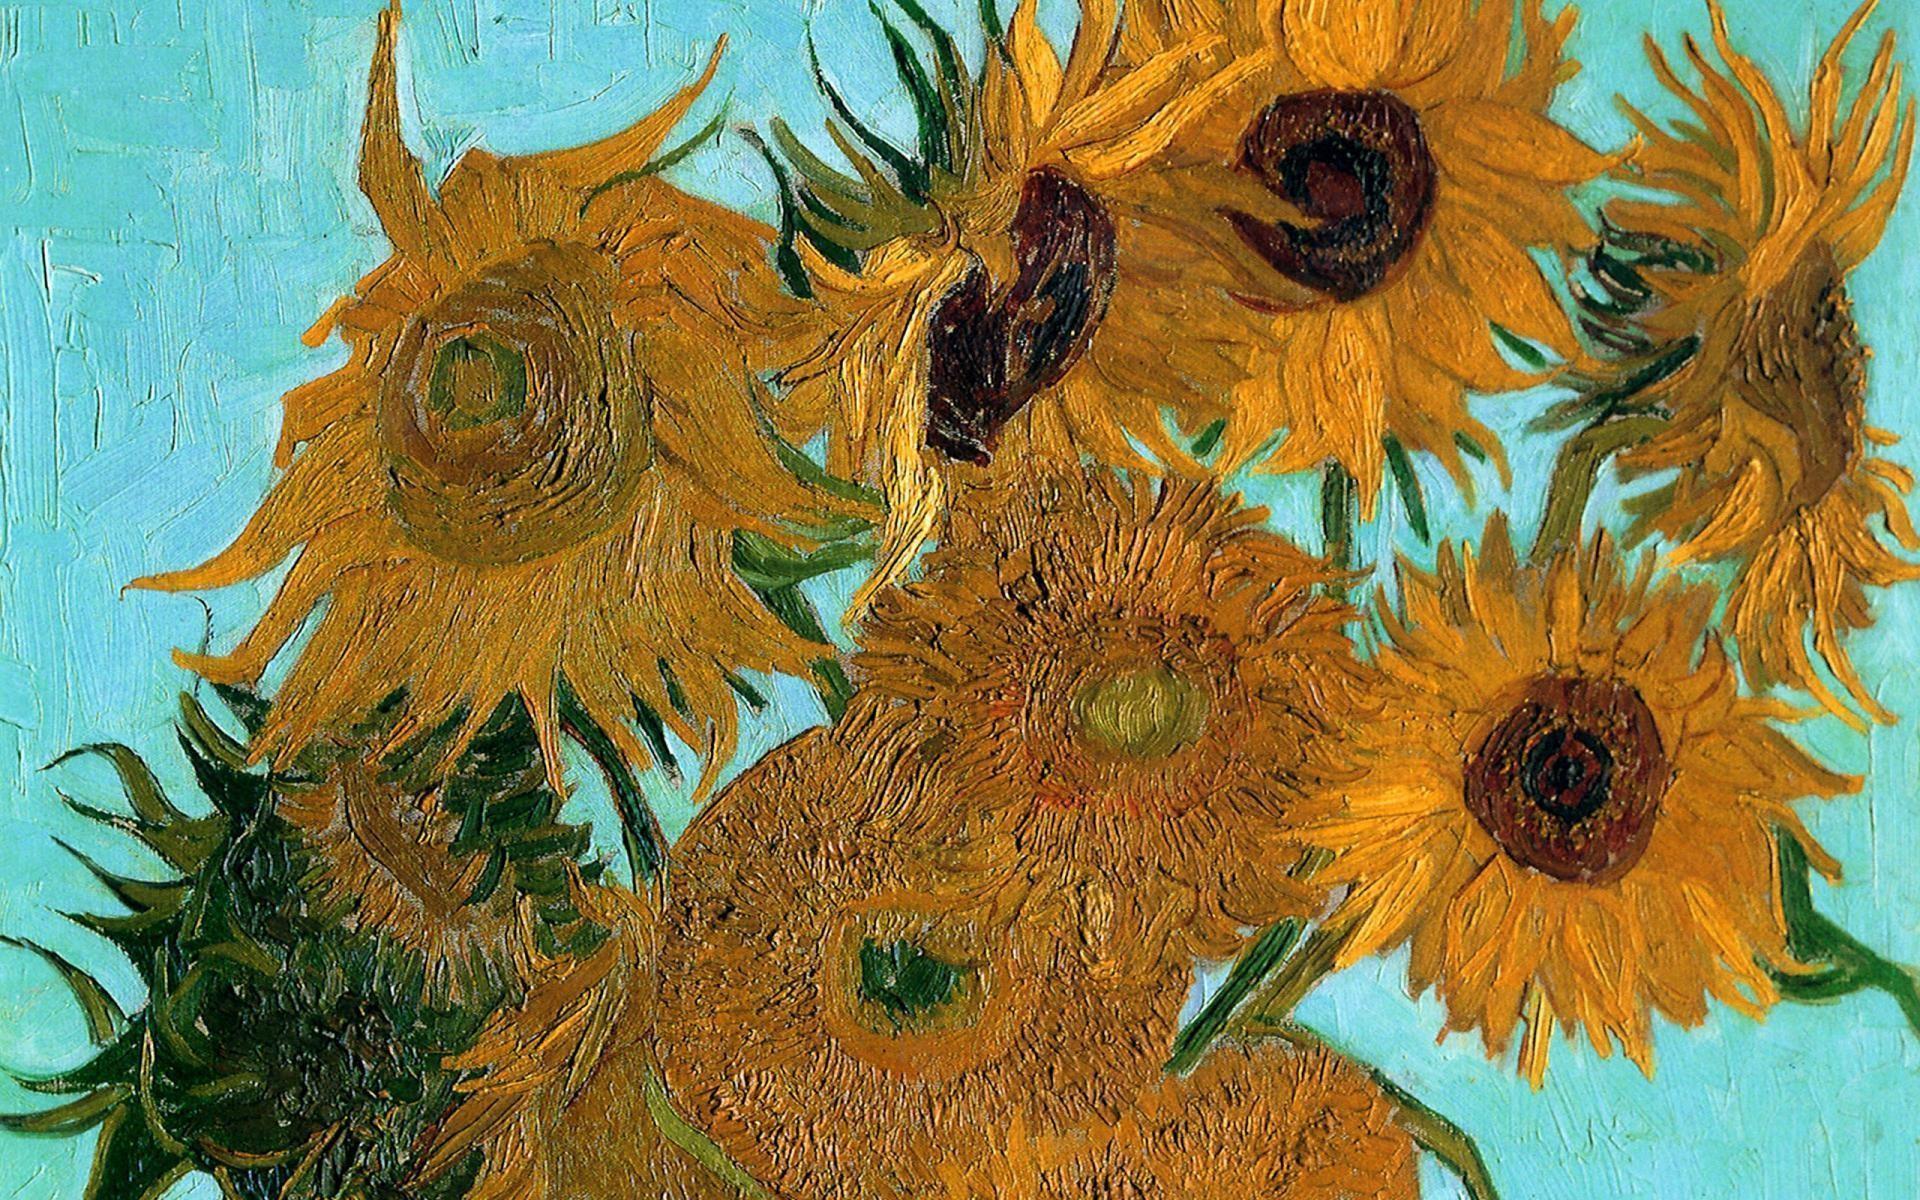 blossoms vincent van gogh artwork almond 3012x2293 wallpaper Art HD Wallpaper · 2560x1600 blossoms vincent van ...